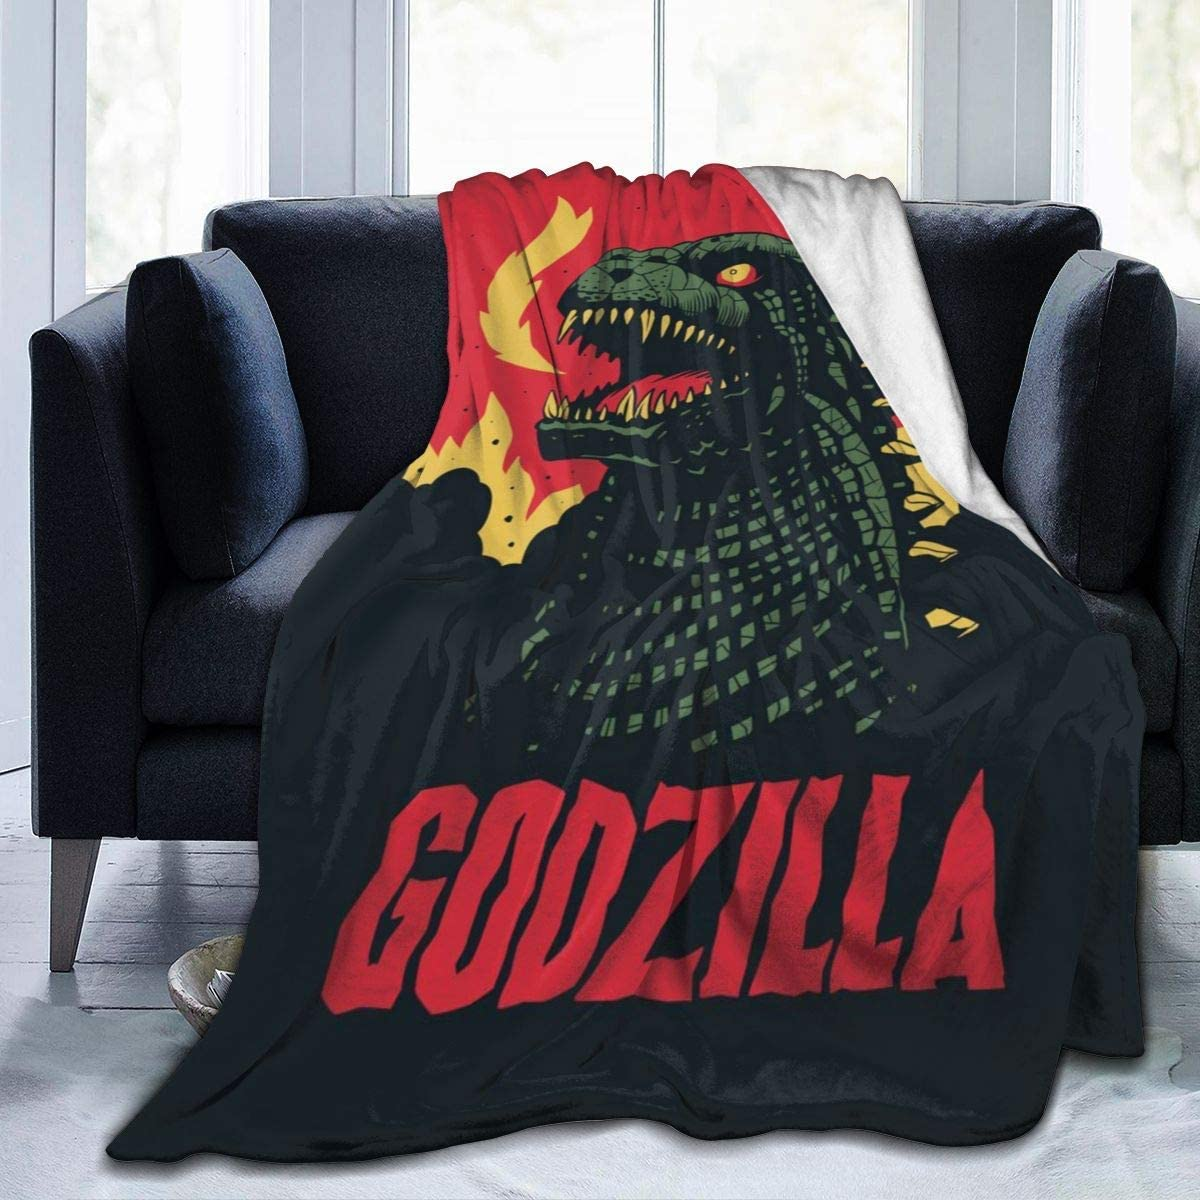 BLANKNTC Mantas de Cama de vellón 3D, pósters clásicos de Monstruos de Godzilla de Anime Mantas navideñas, Manta de Juego súper Suave y Liviana para Preescolar de Oficina para Adultos S